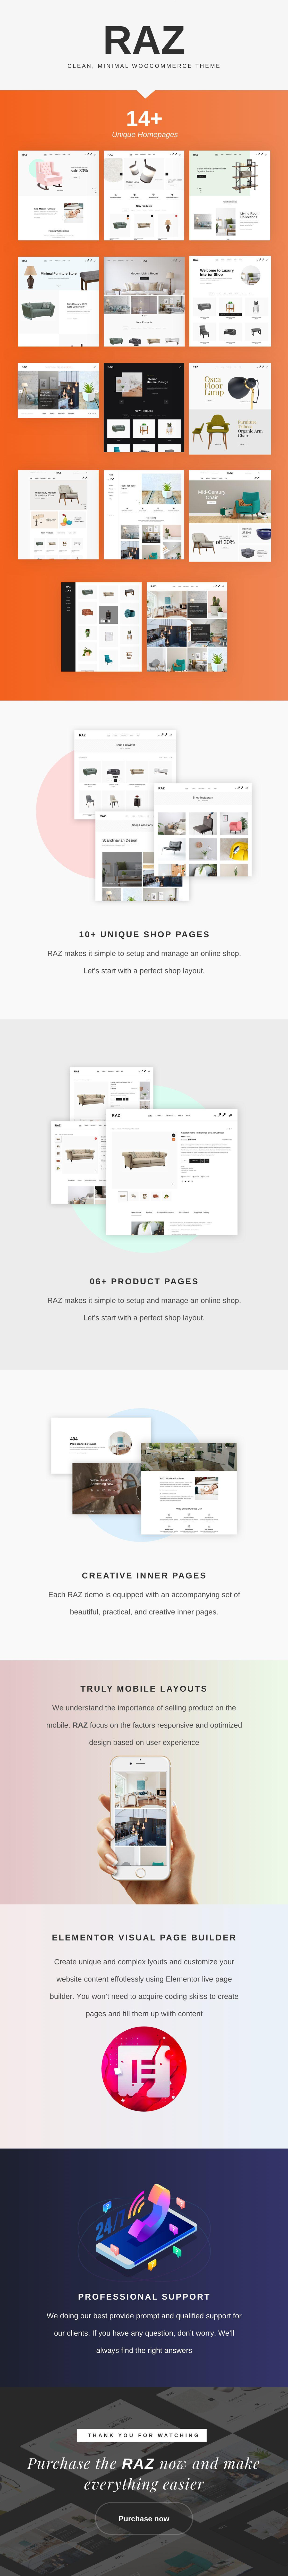 Raz - Clean, Minimal WooCommerce Theme - 1